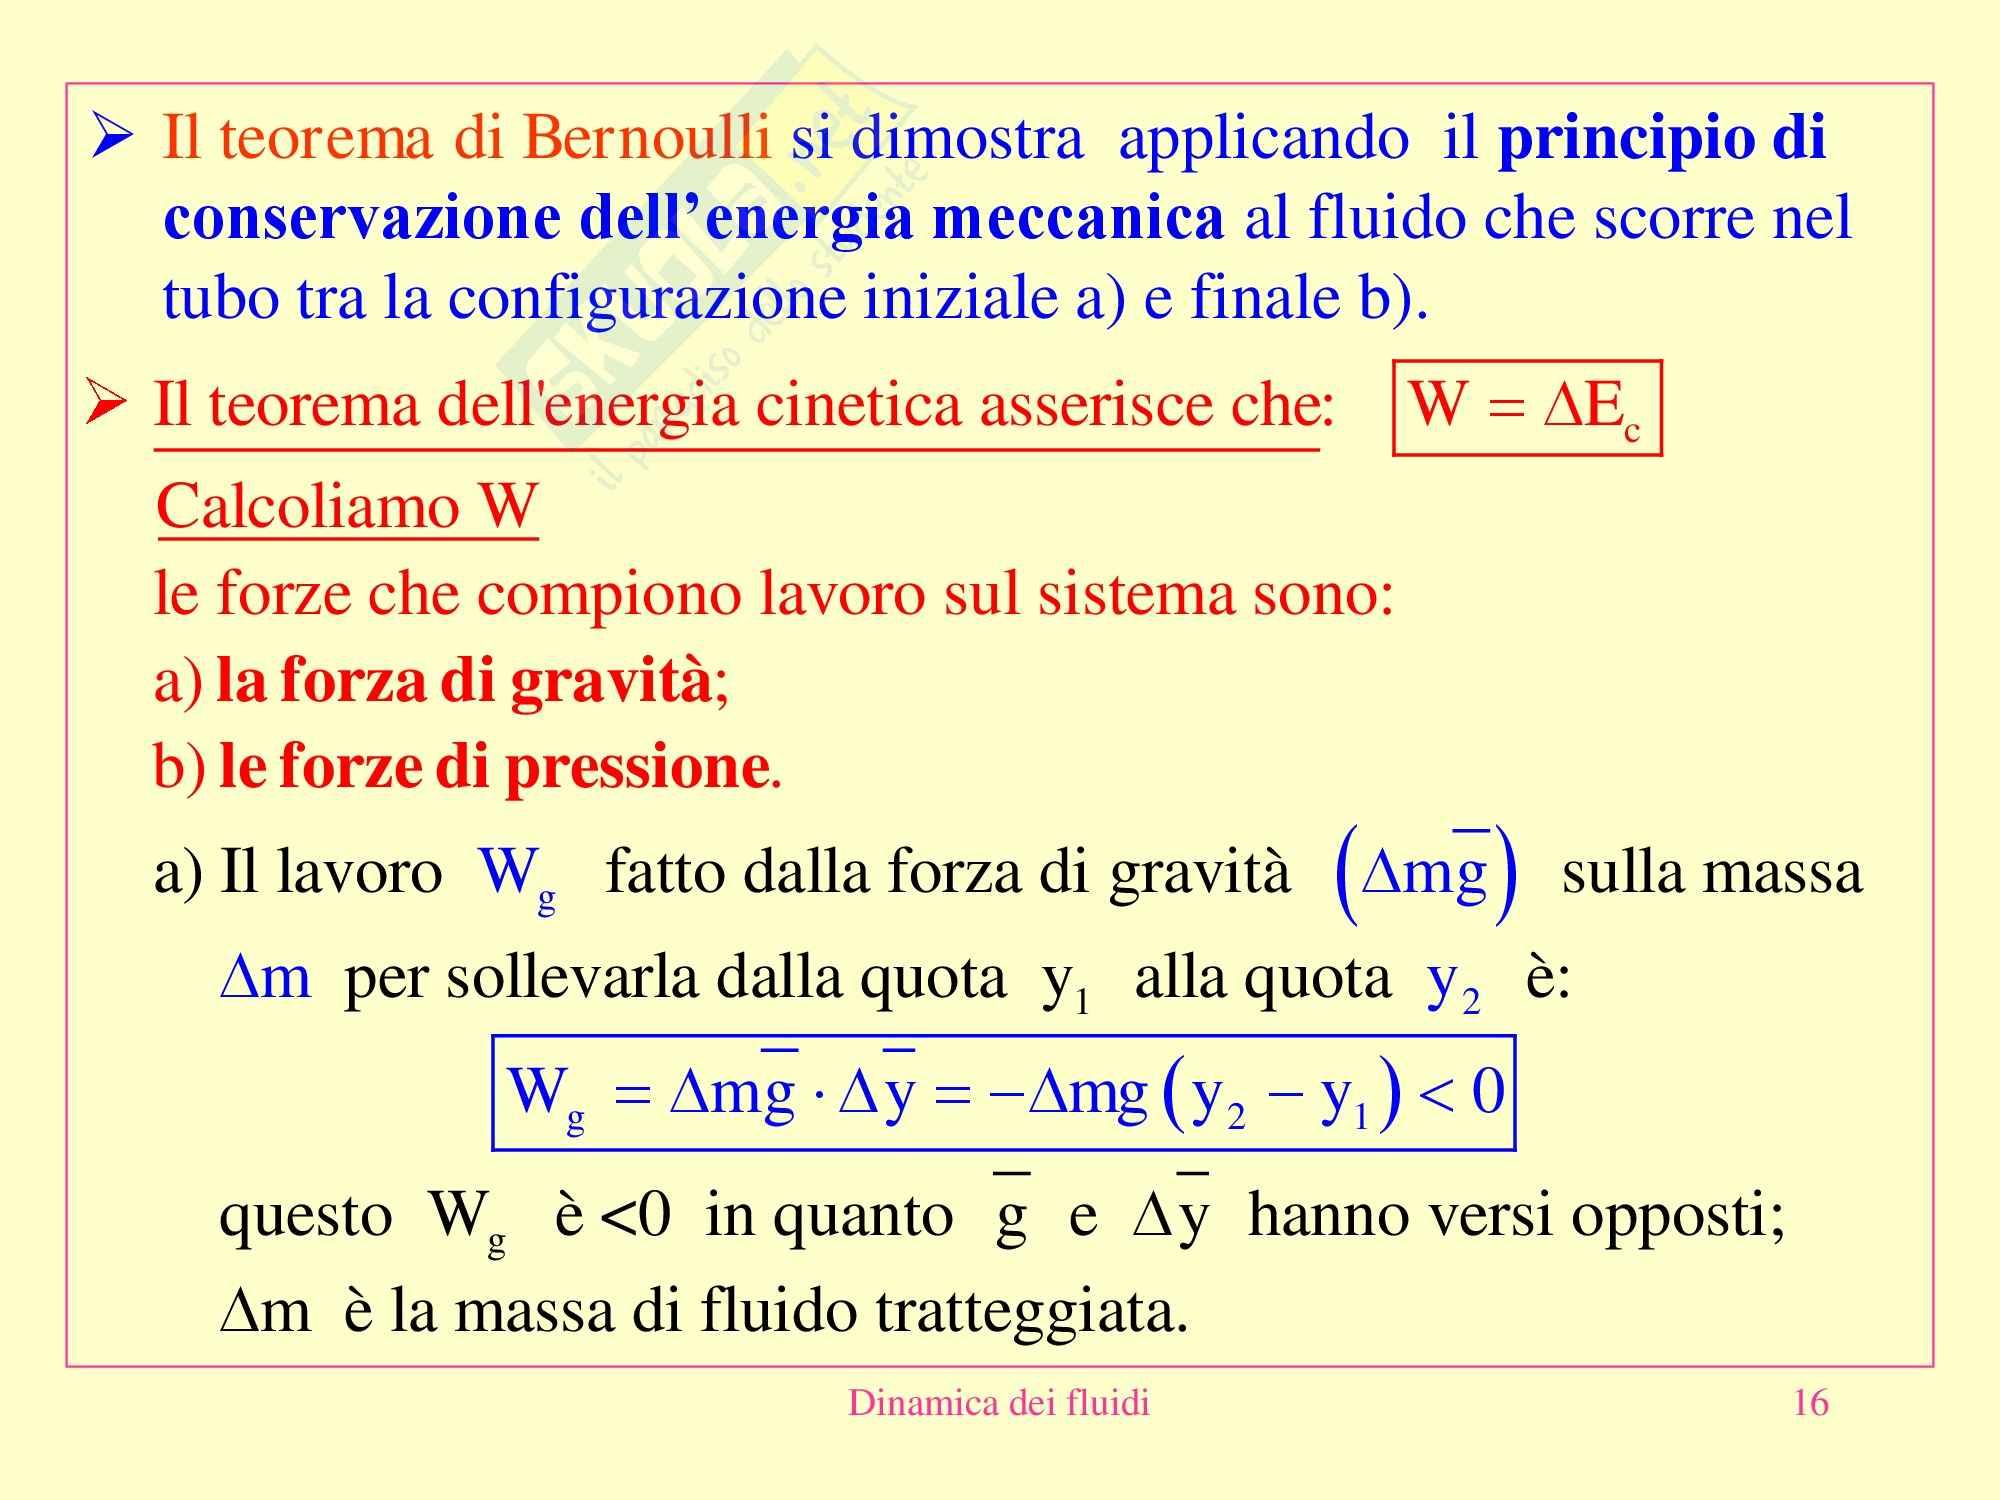 Fisica medica - dinamica dei fluidi Pag. 16